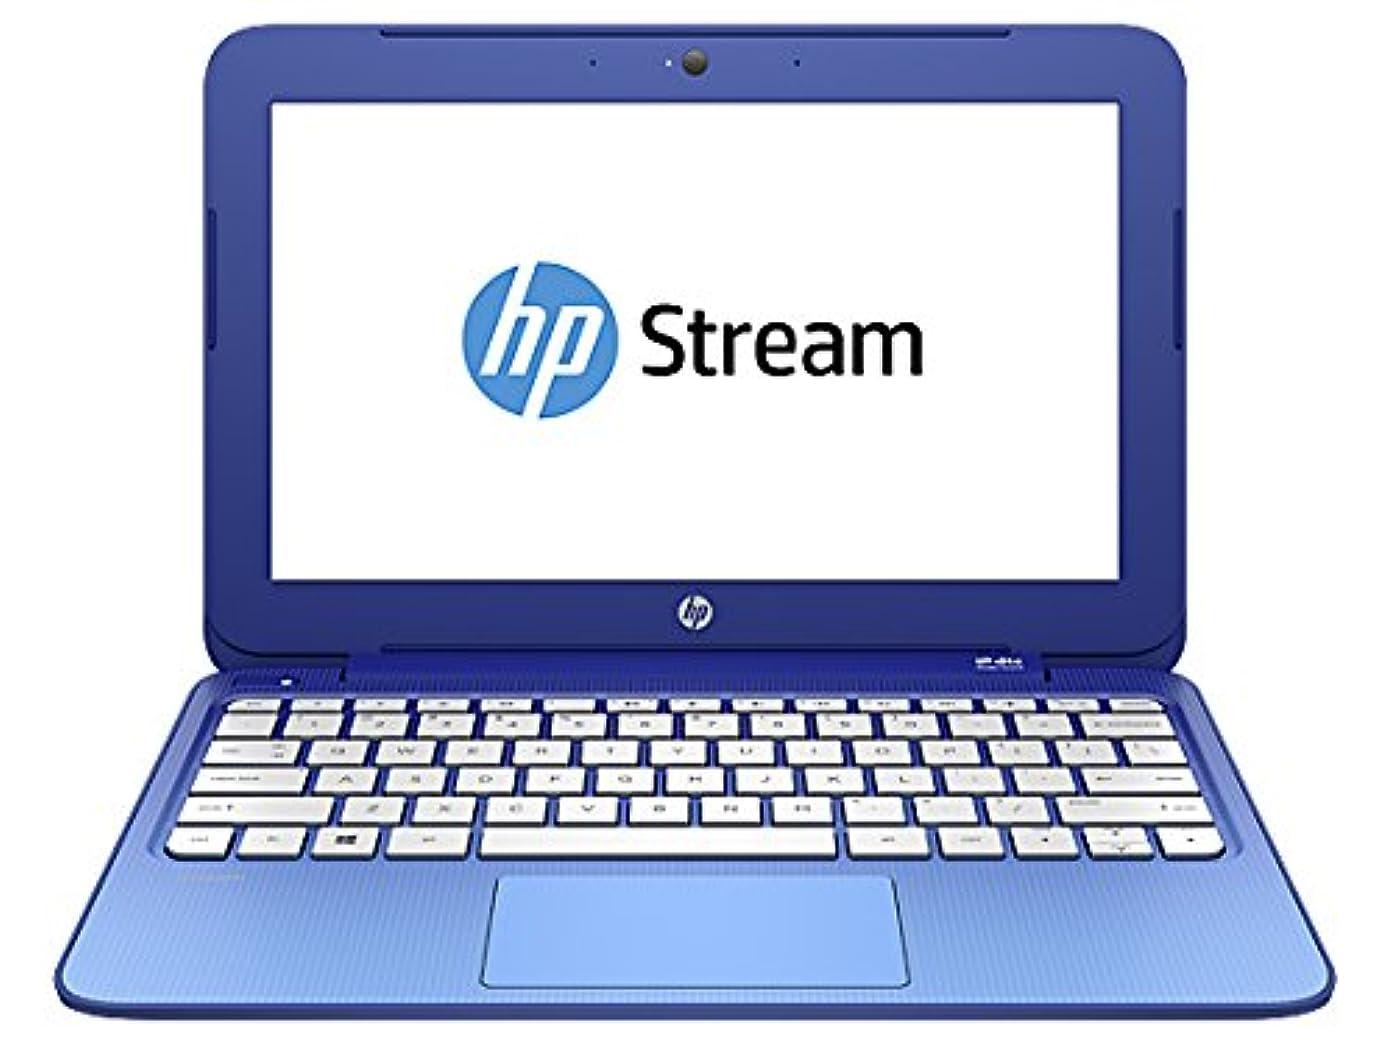 HP Stream 11-d077nr Notebook PC (Intel Celeron N2840, 2 GB RAM, 32 GB eMMC)